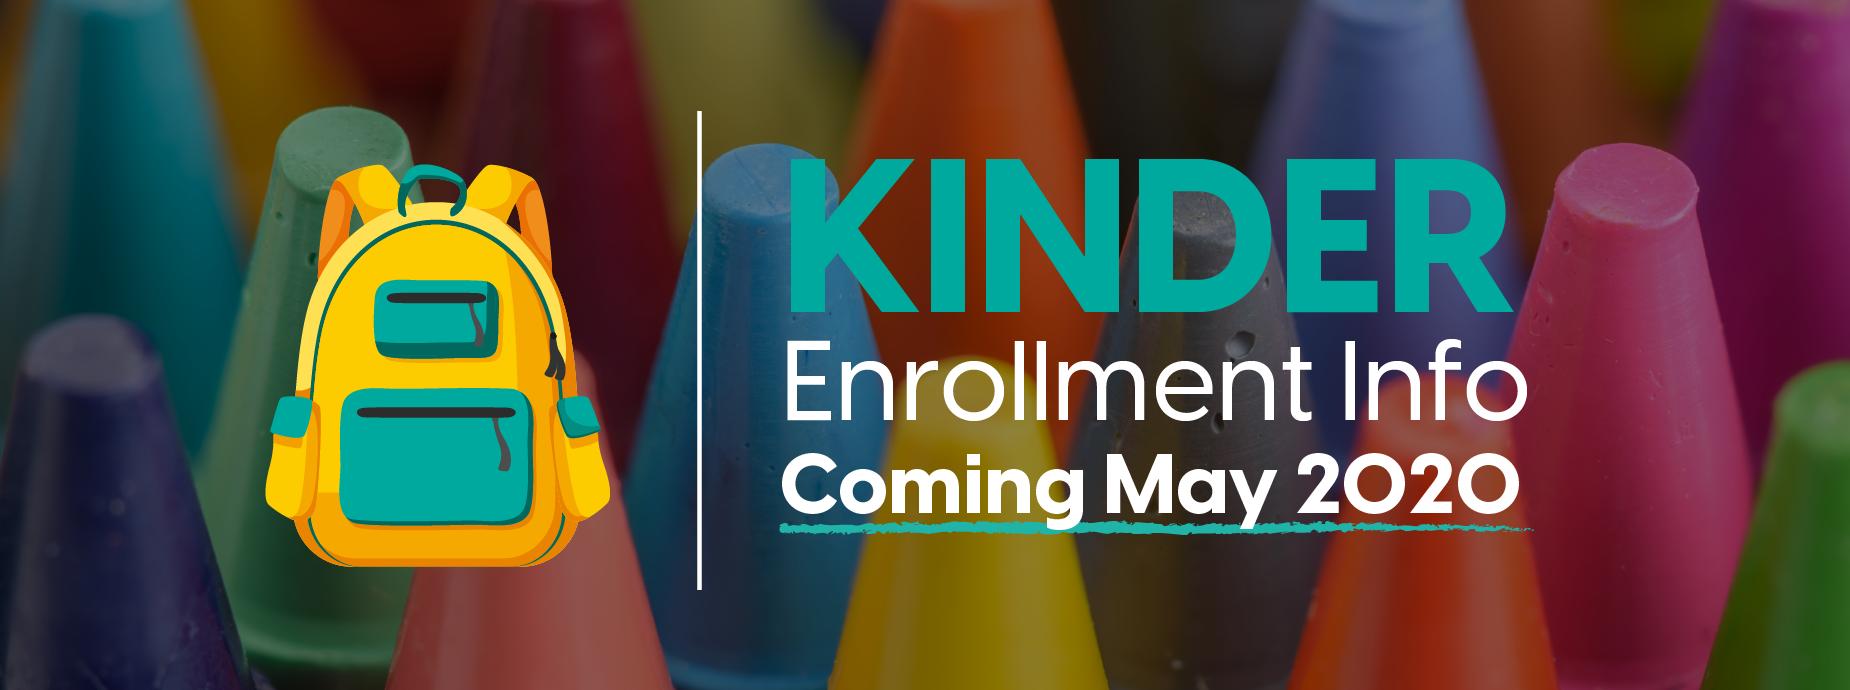 Kinder Enrollment Info Coming May 2020